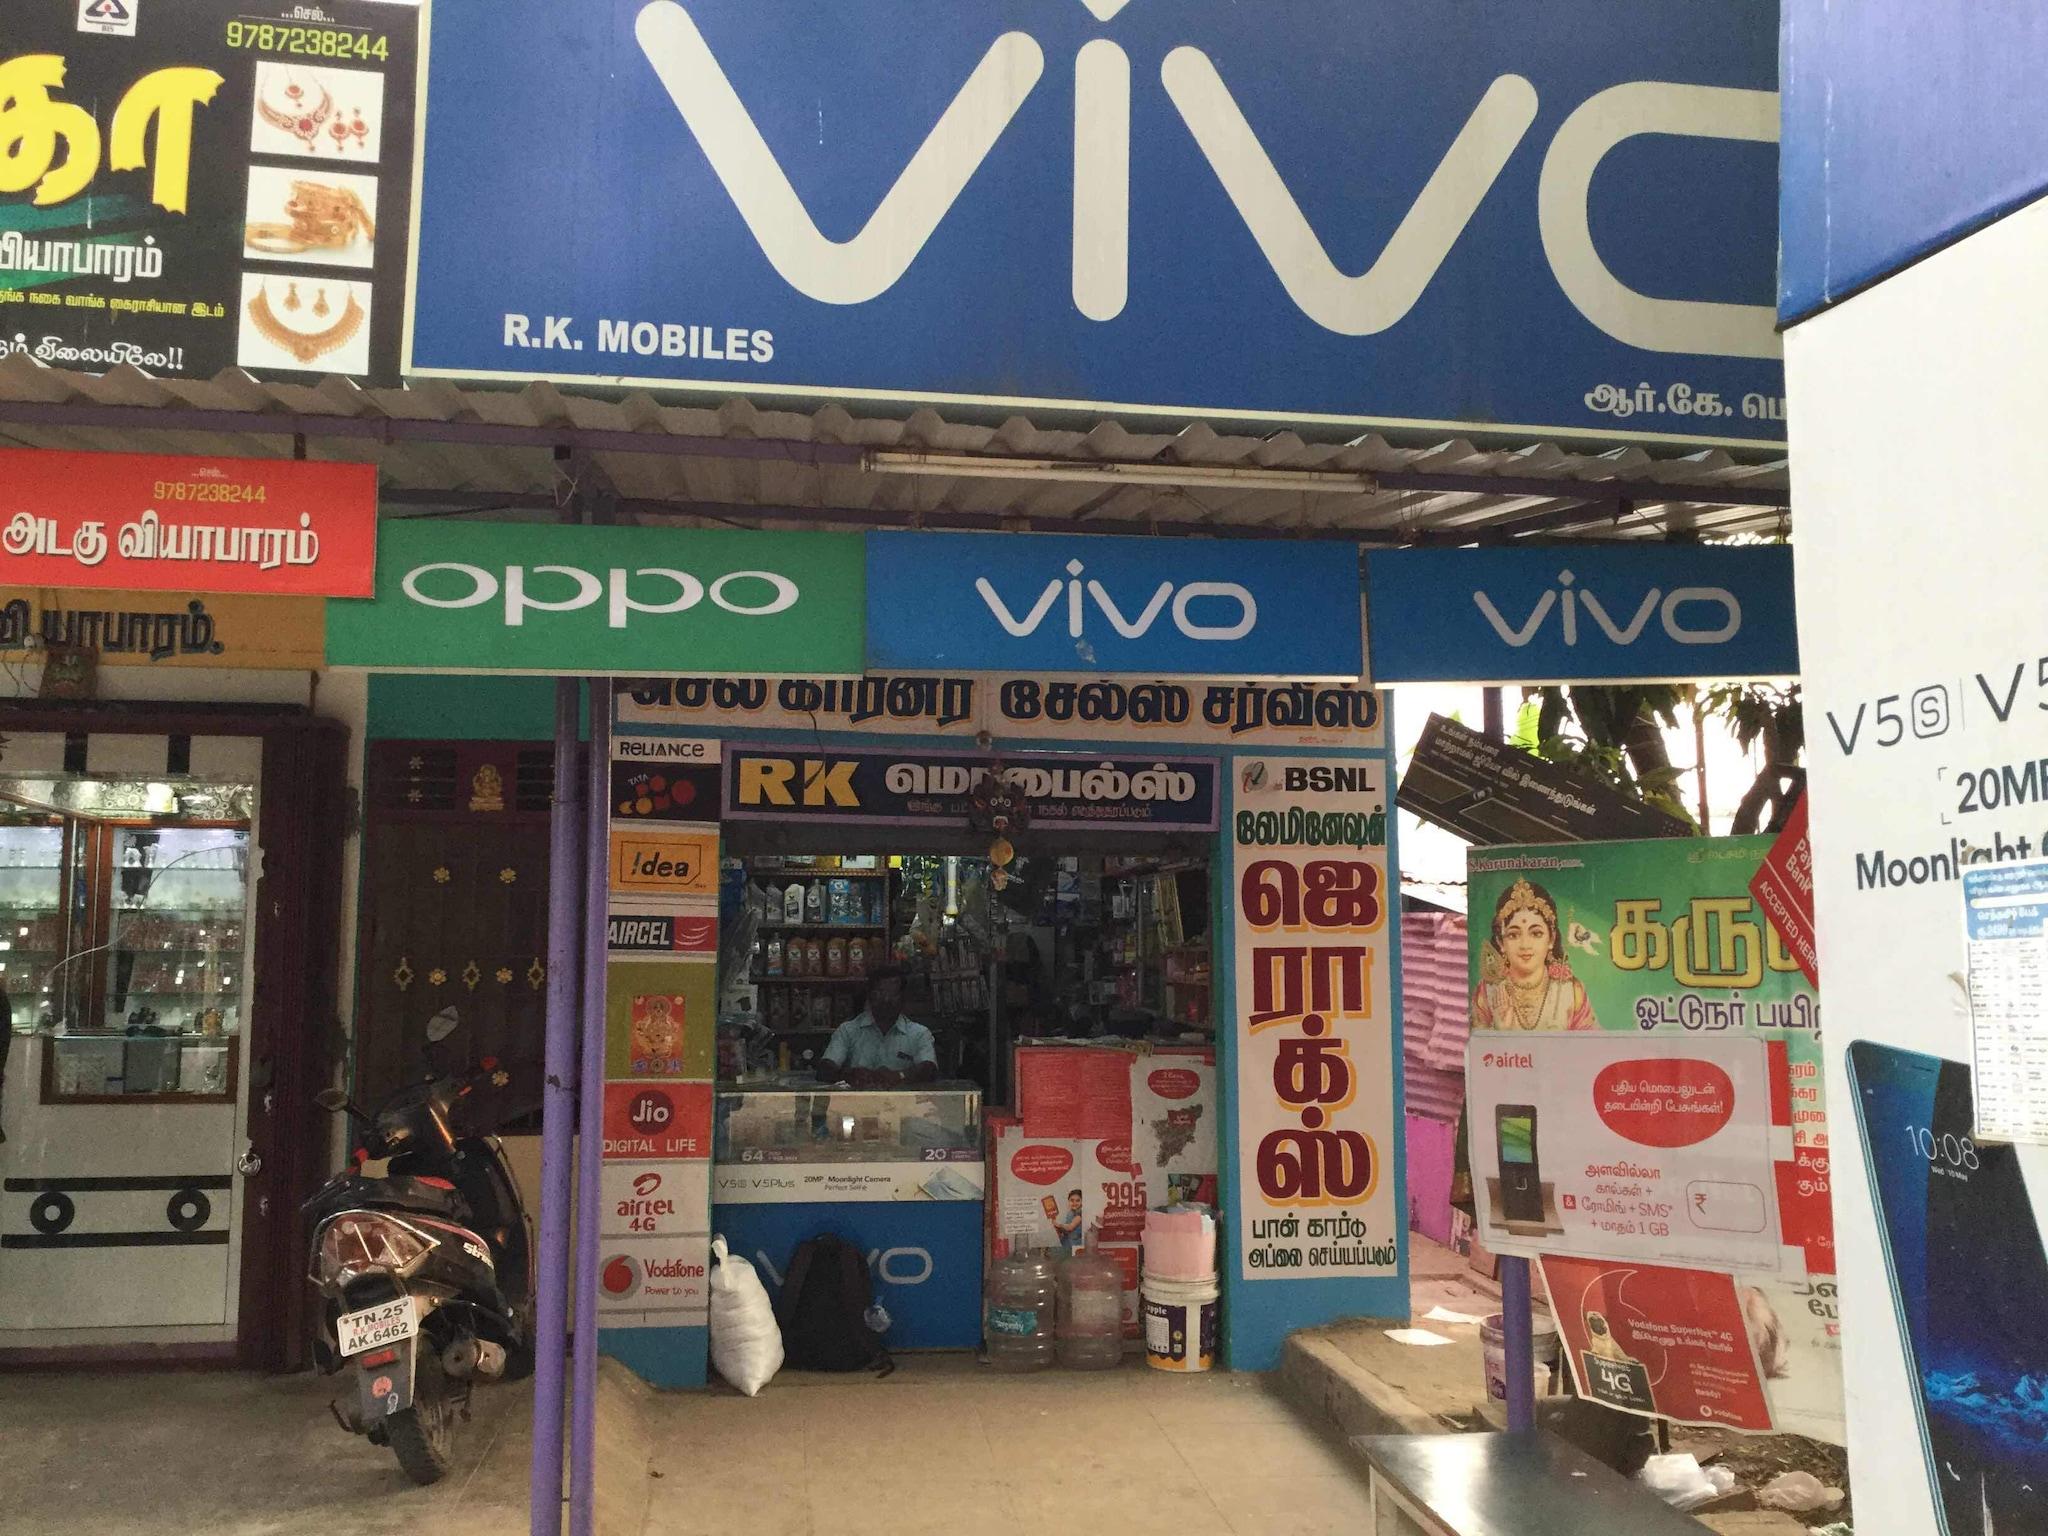 Top 30 Airtel Prepaid Mobile Phone Simcard Dealers in Kalasapakkam